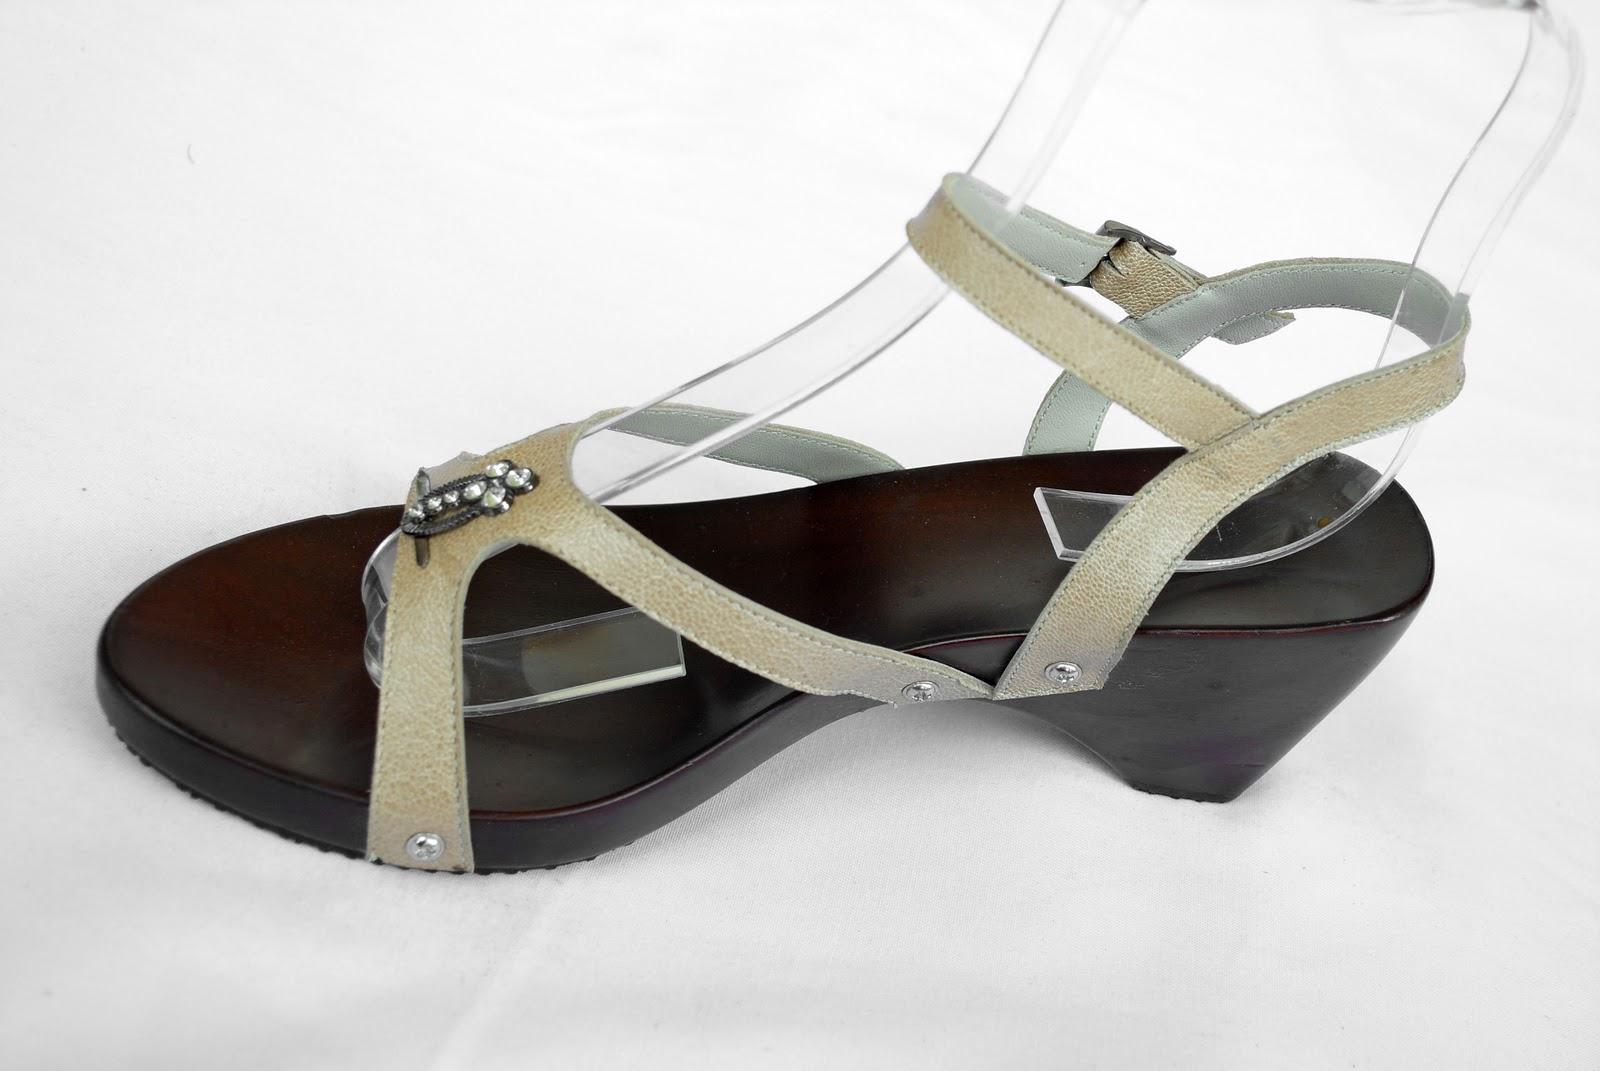 Mangrupa Sandal & Sepatu Kayu Lukis Kulit